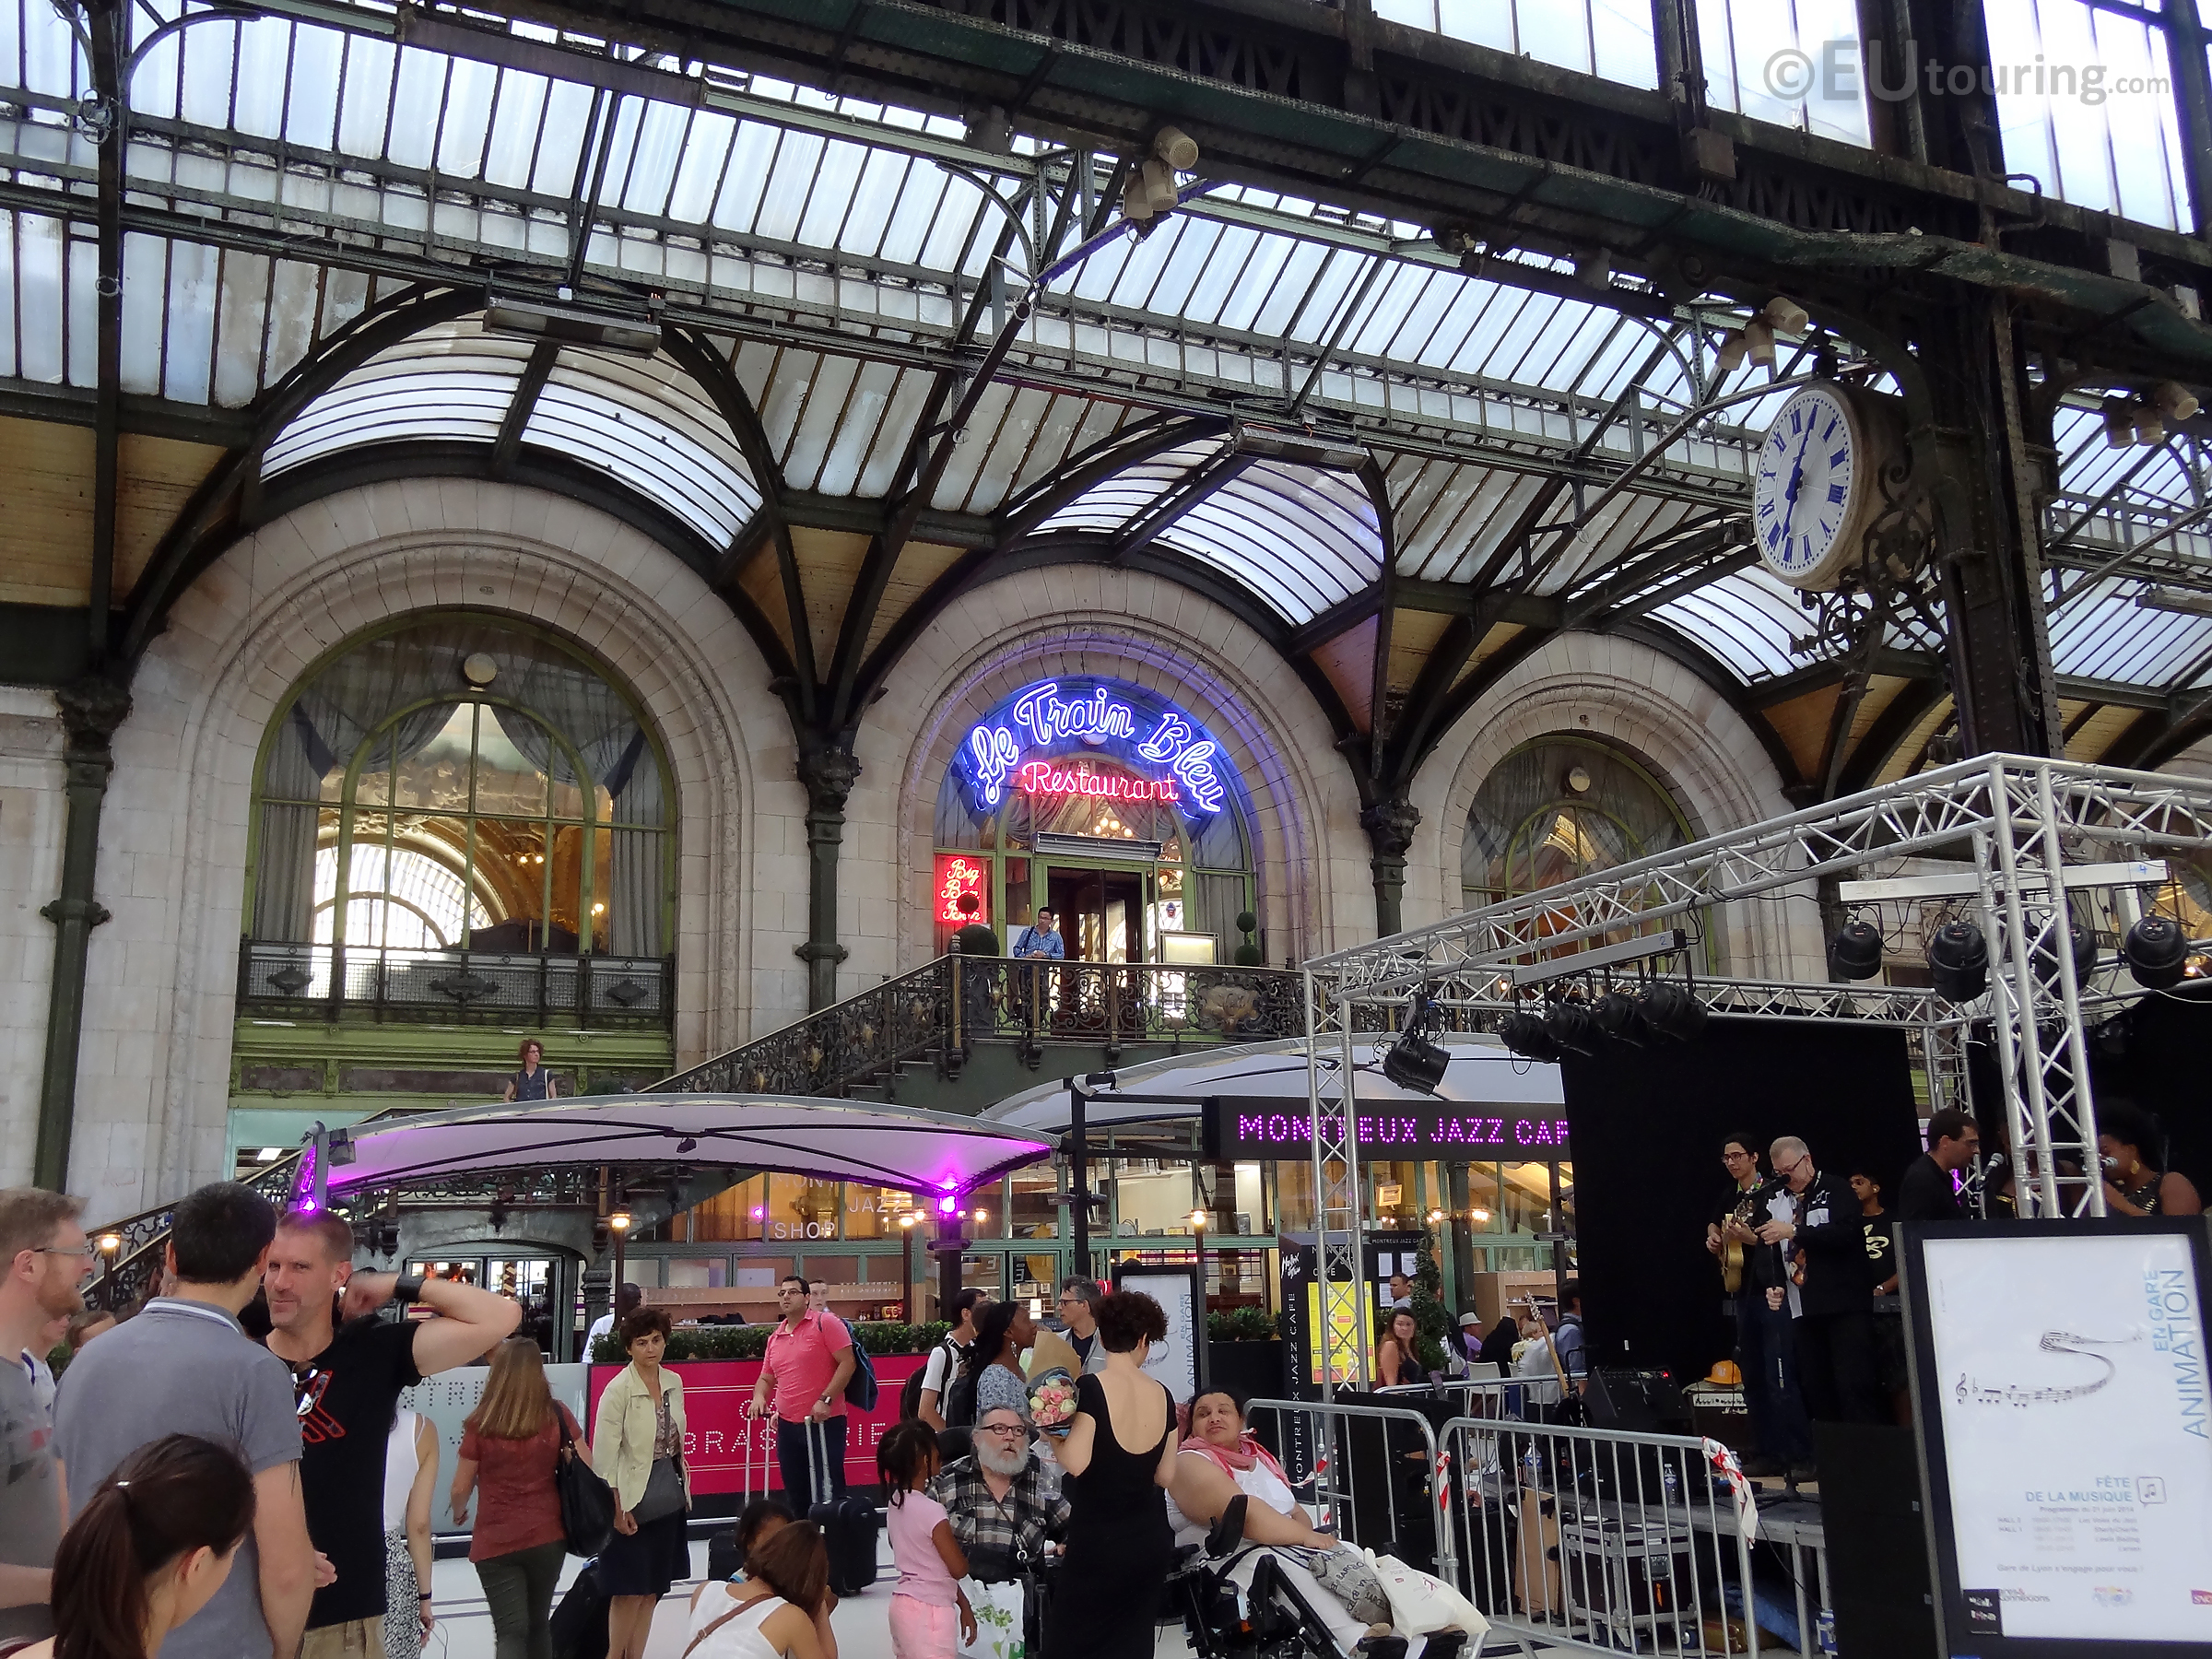 View inside Gare de Lyon